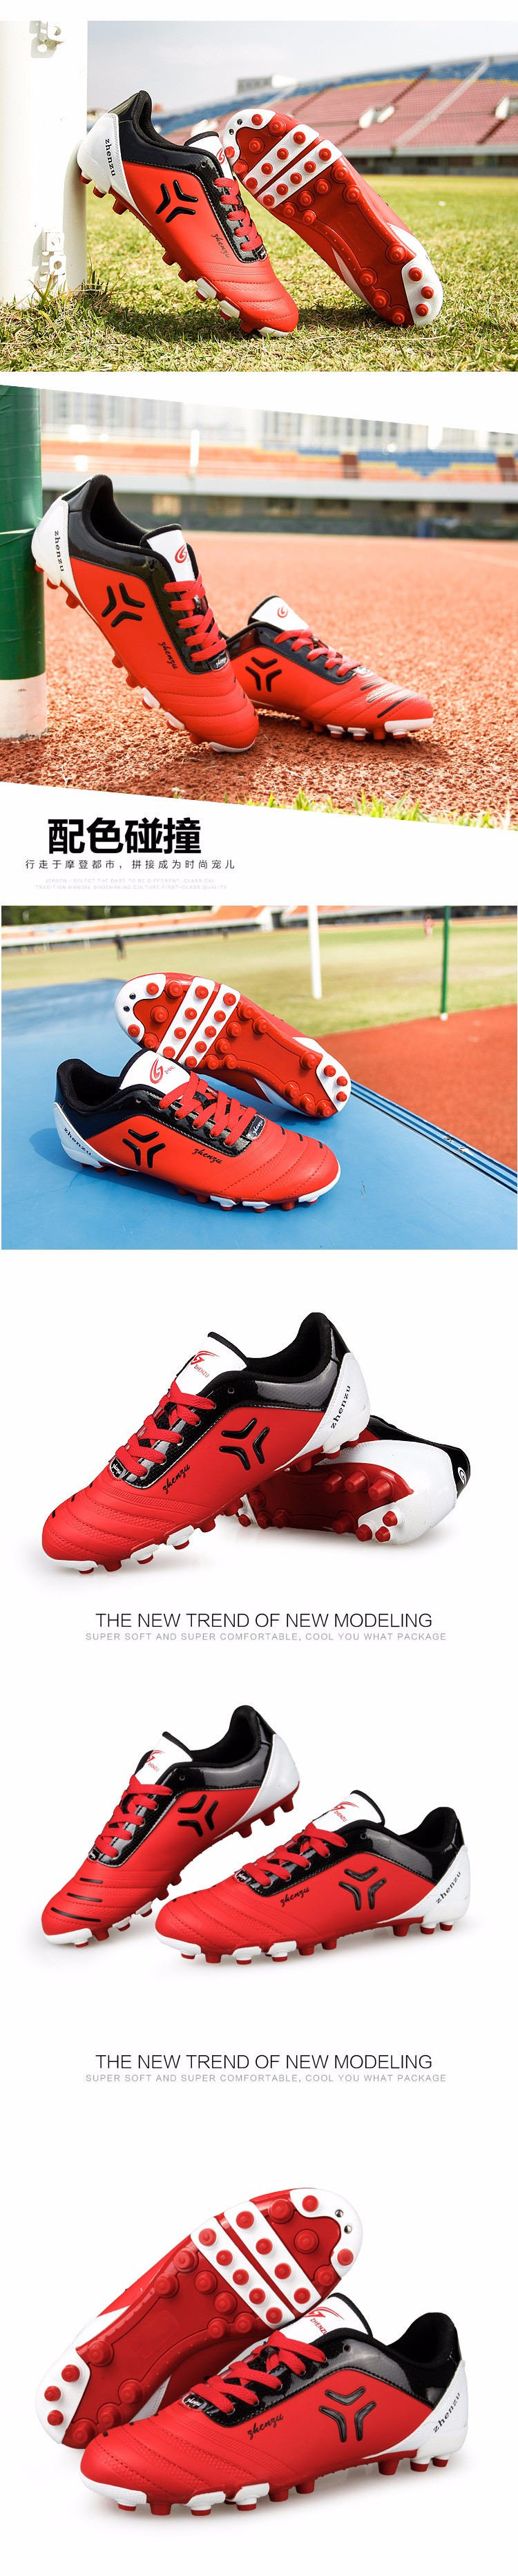 ZHENZU 2017 Football Shoes Soccer Cleats Boots chuteira futebol Training Teenagers Kids AG Artificial Ground chaussure foot  2